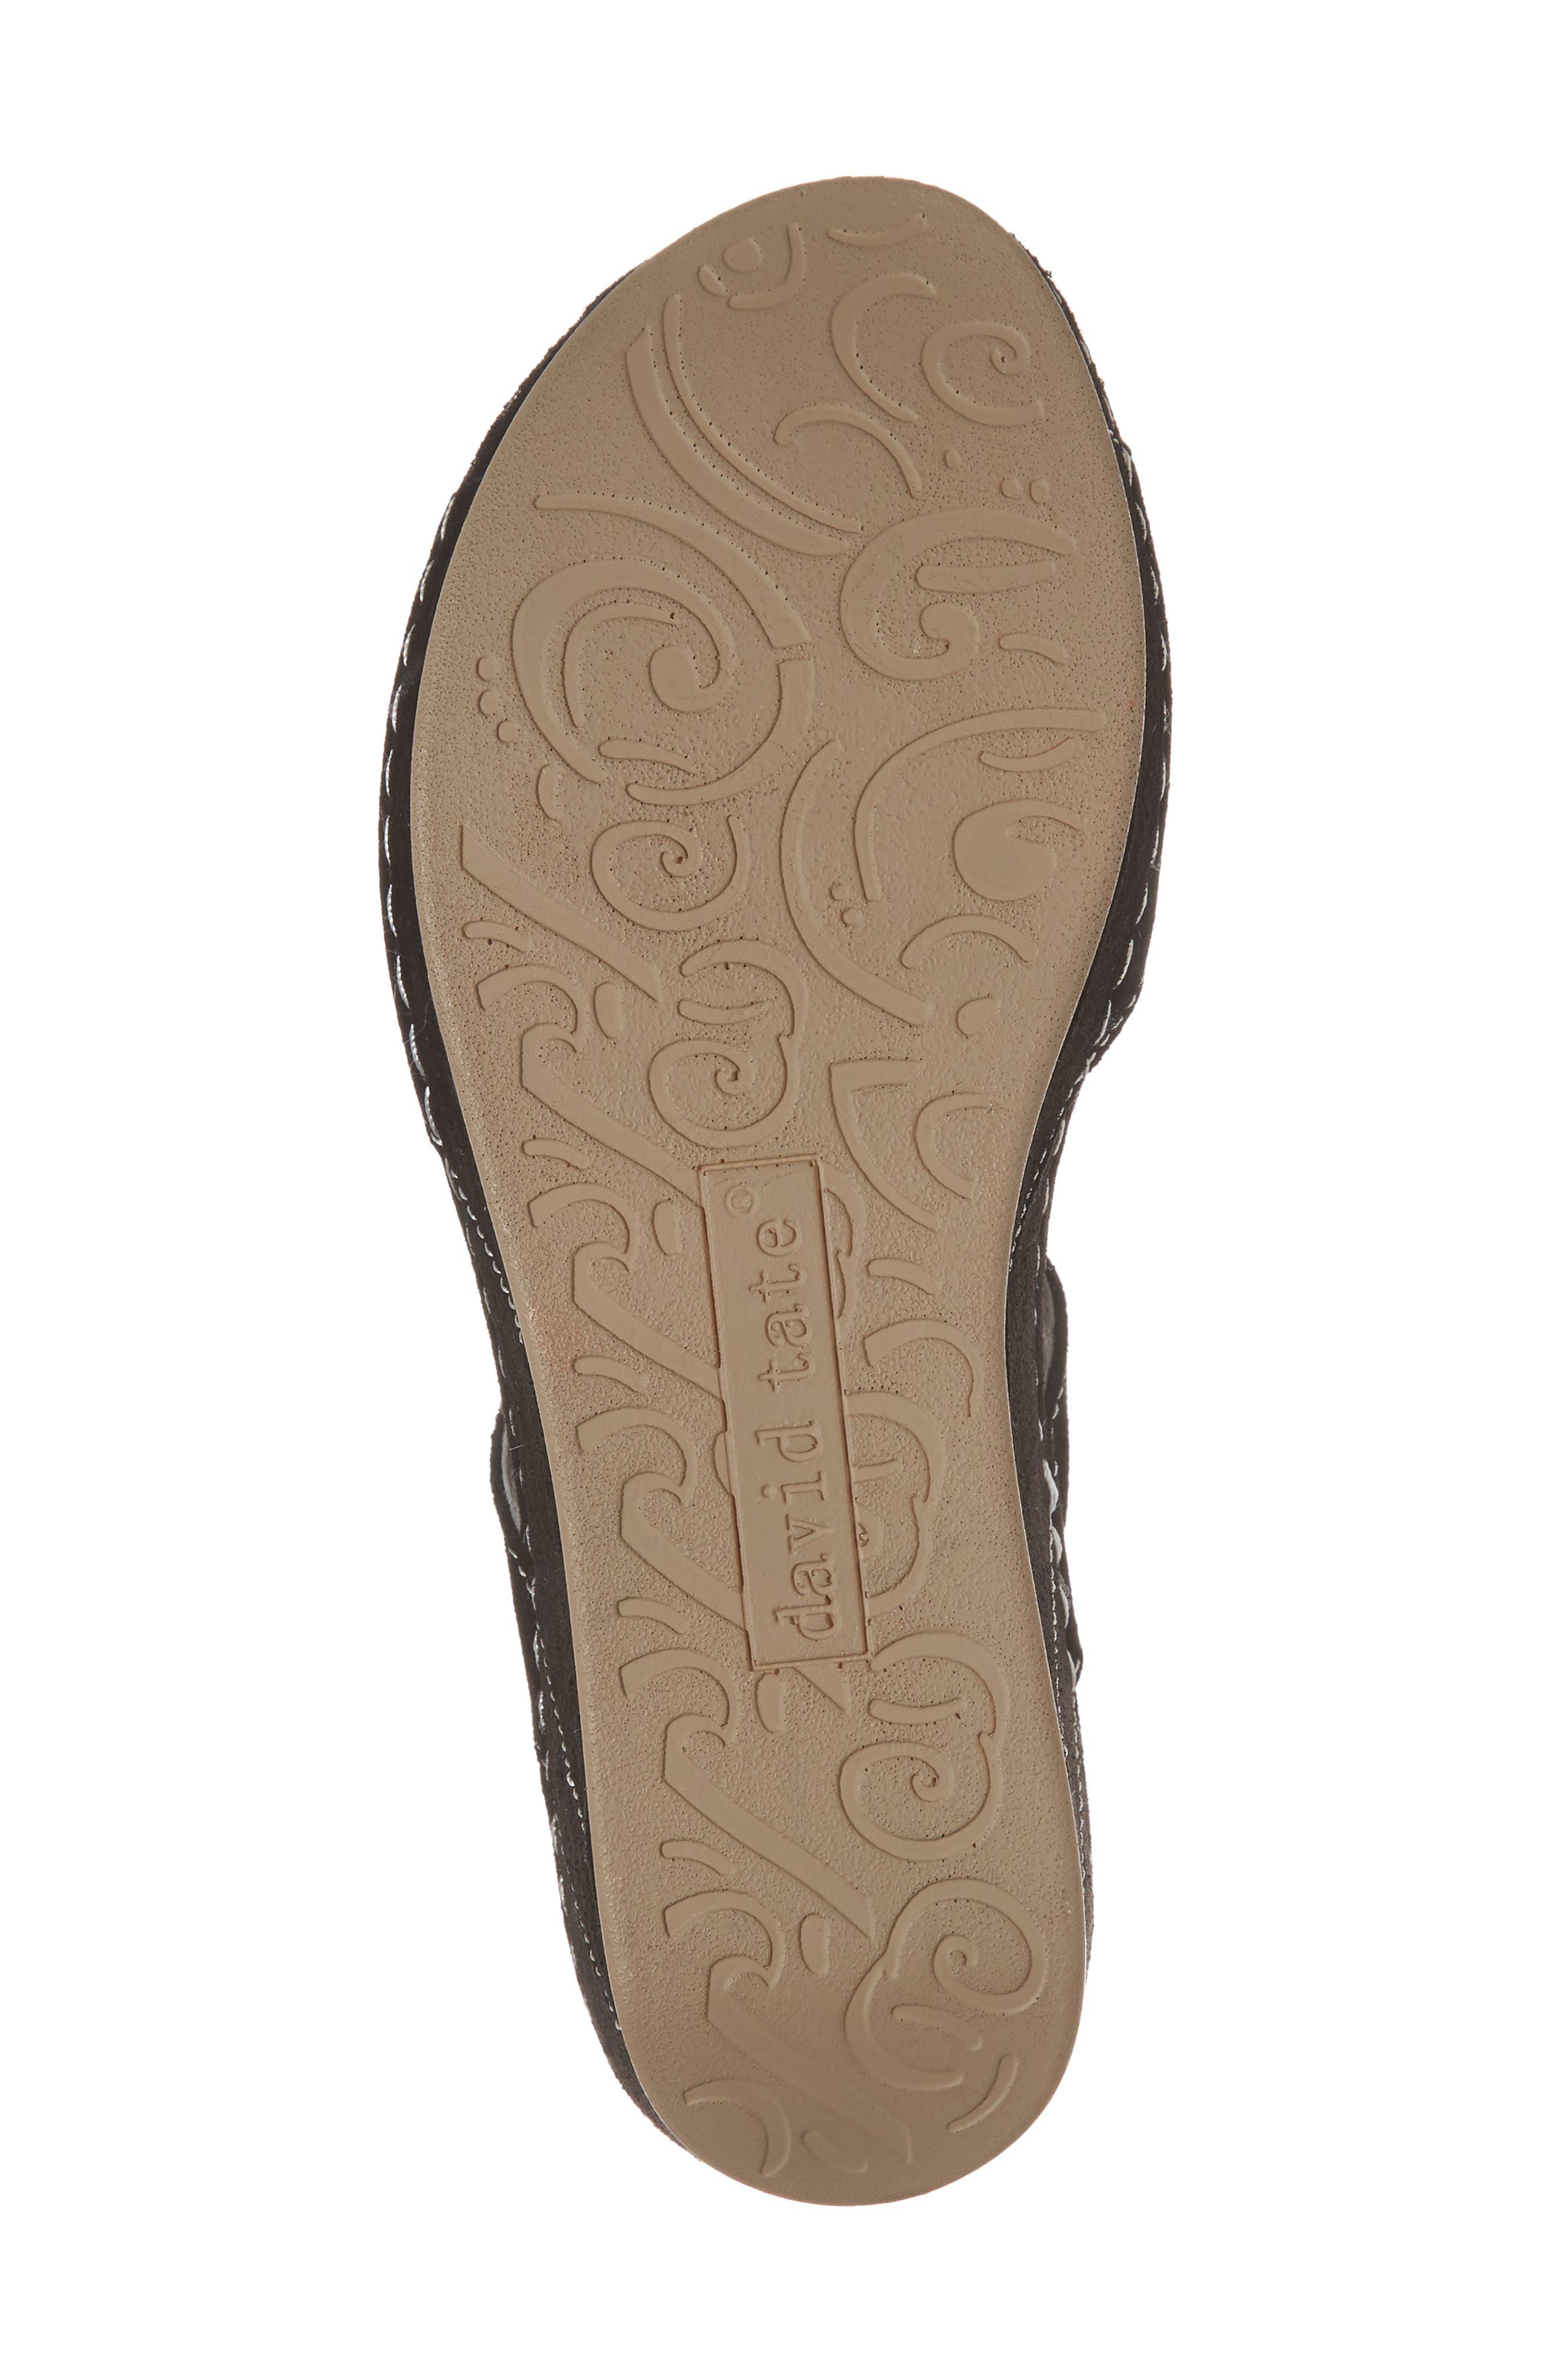 DAVID TATE, Bubbly Embellished T-Strap Wedge Sandal, Alternate thumbnail 6, color, BLACK SUEDE